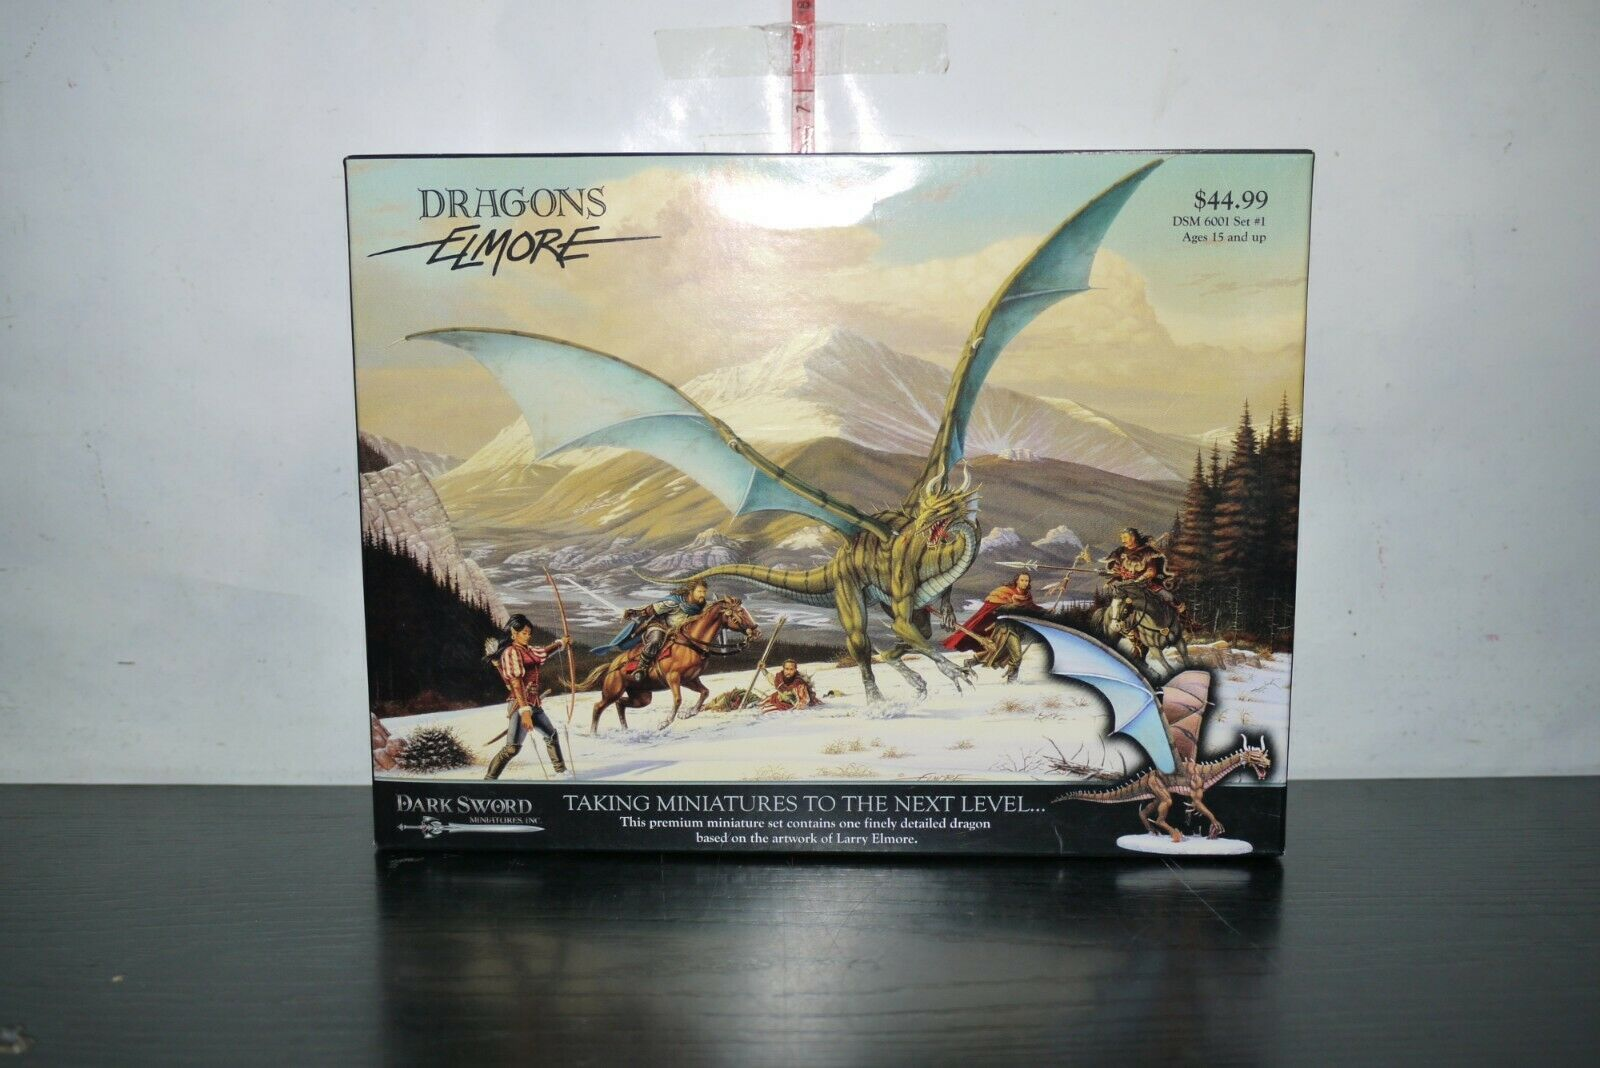 METAL GREEN DRAGON DARK SWORD MINIATURES ELMORE DSM 6001 SET BOXED